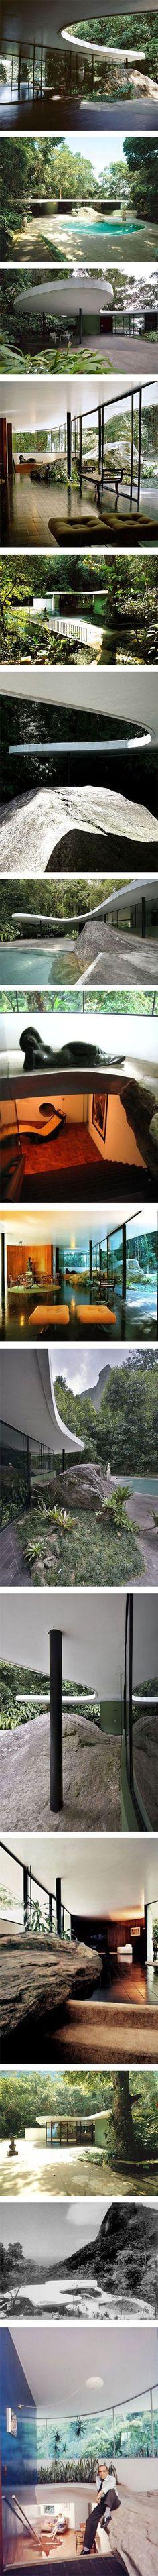 Oscar Niemeyer\'s family home \'Casa Das Canoas\